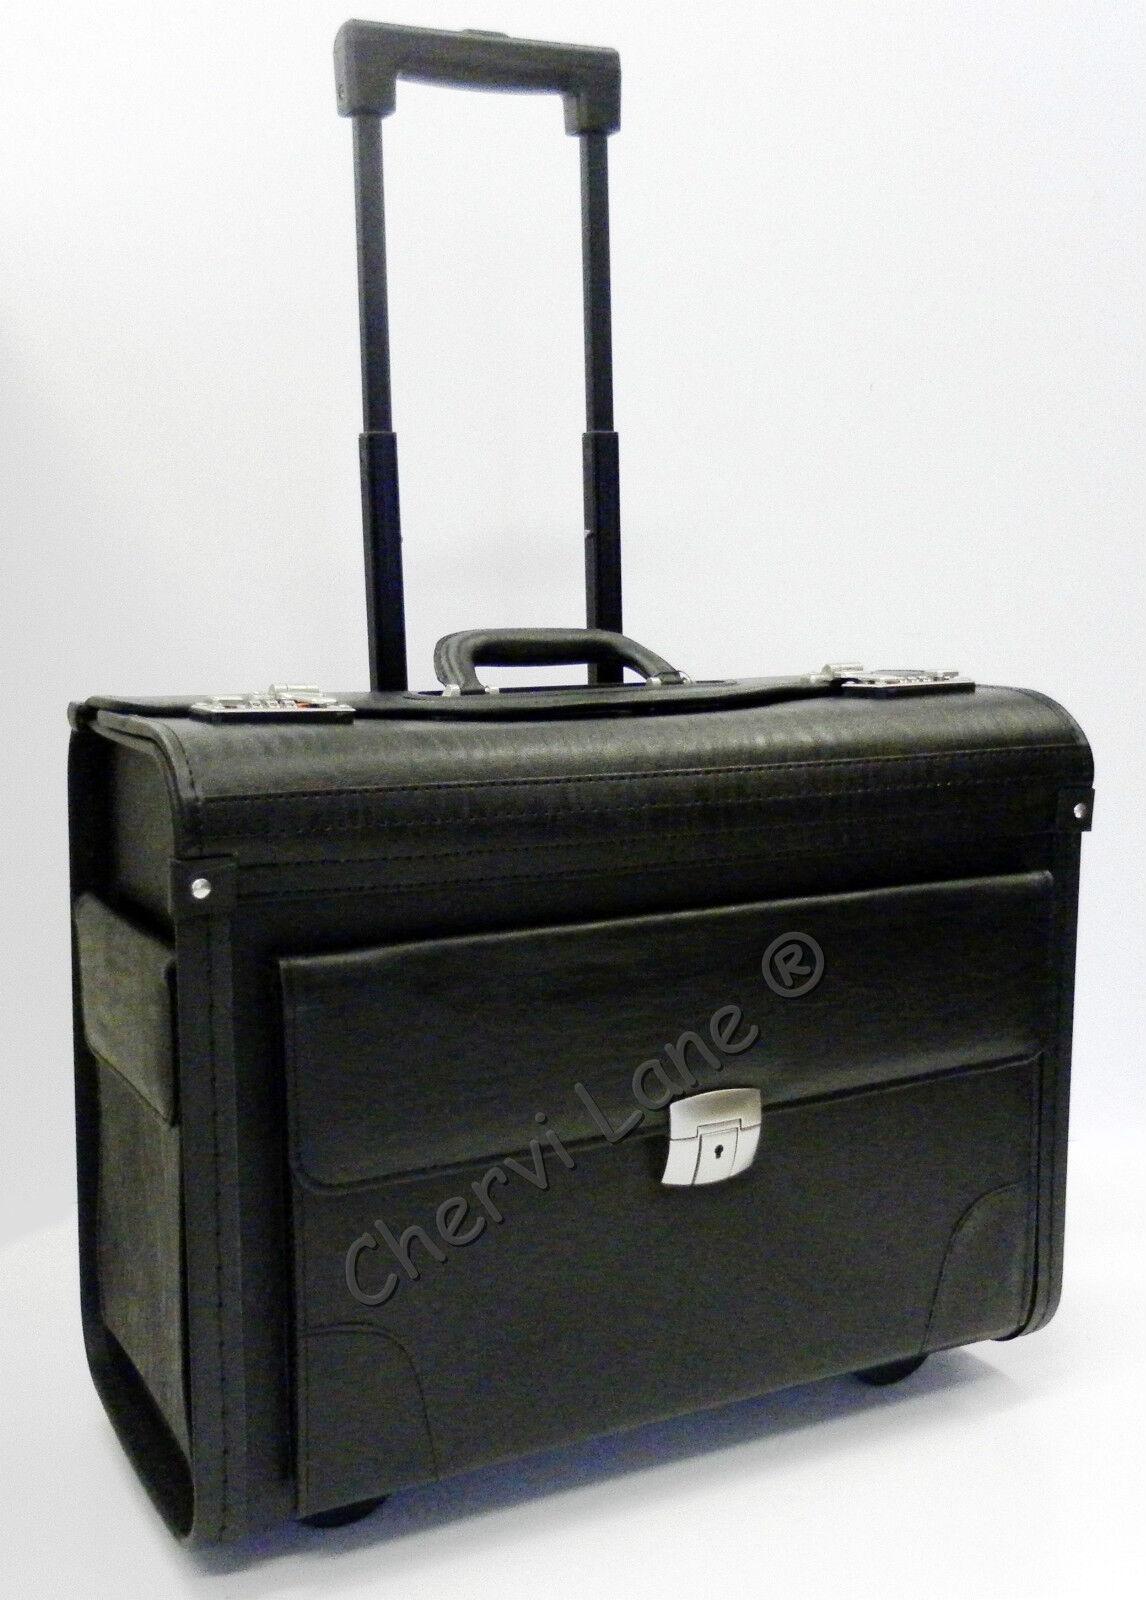 wheeled business black executive laptop flight pilot bag trolley case briefcase. Black Bedroom Furniture Sets. Home Design Ideas